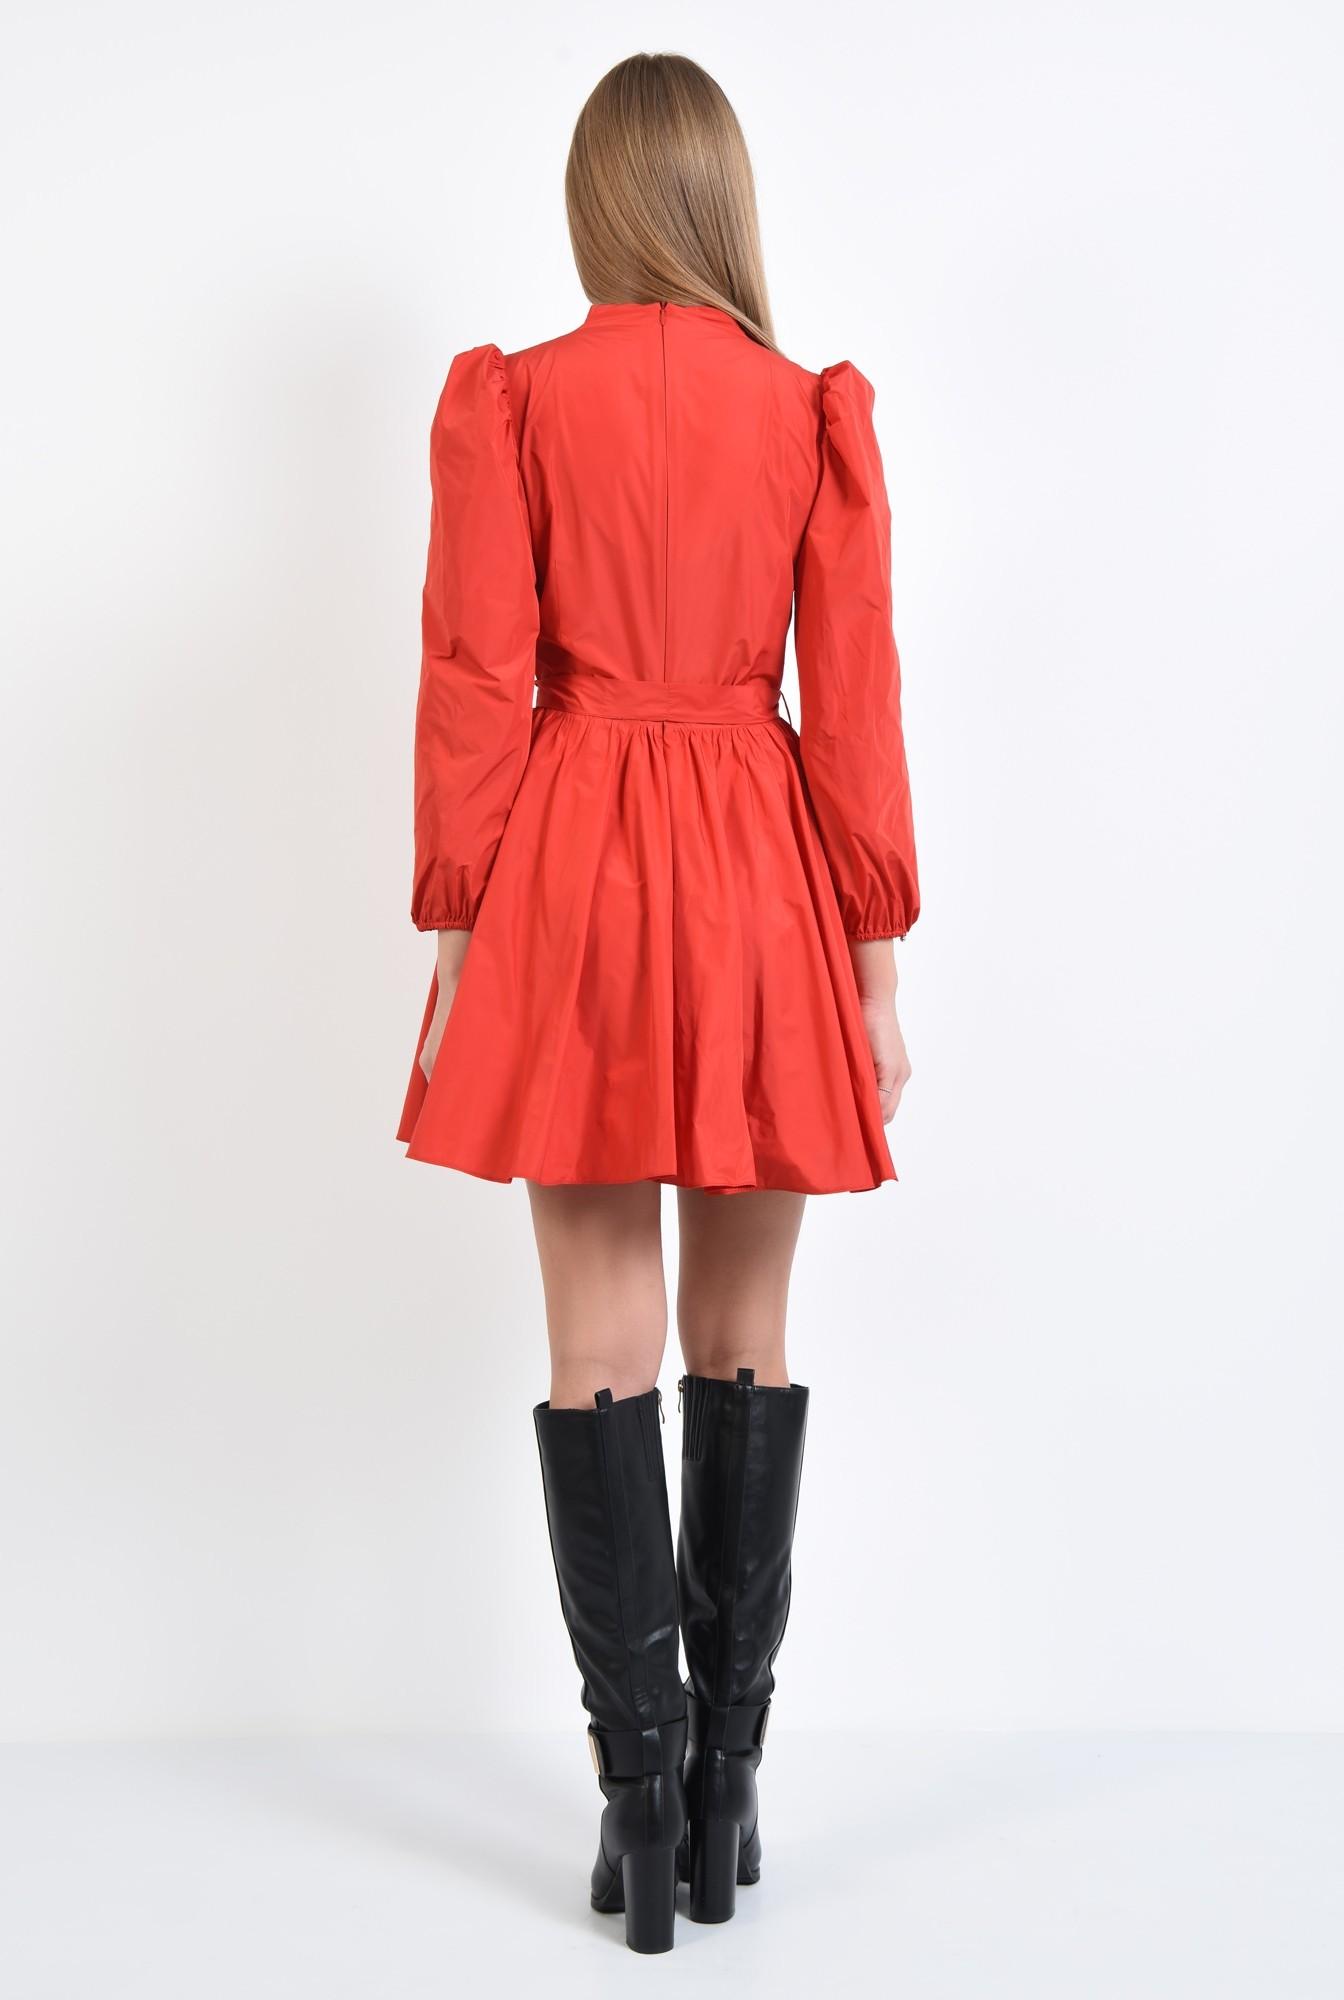 1 - 360 - rochie de zi, rosie, aspect sifonat, croi clos